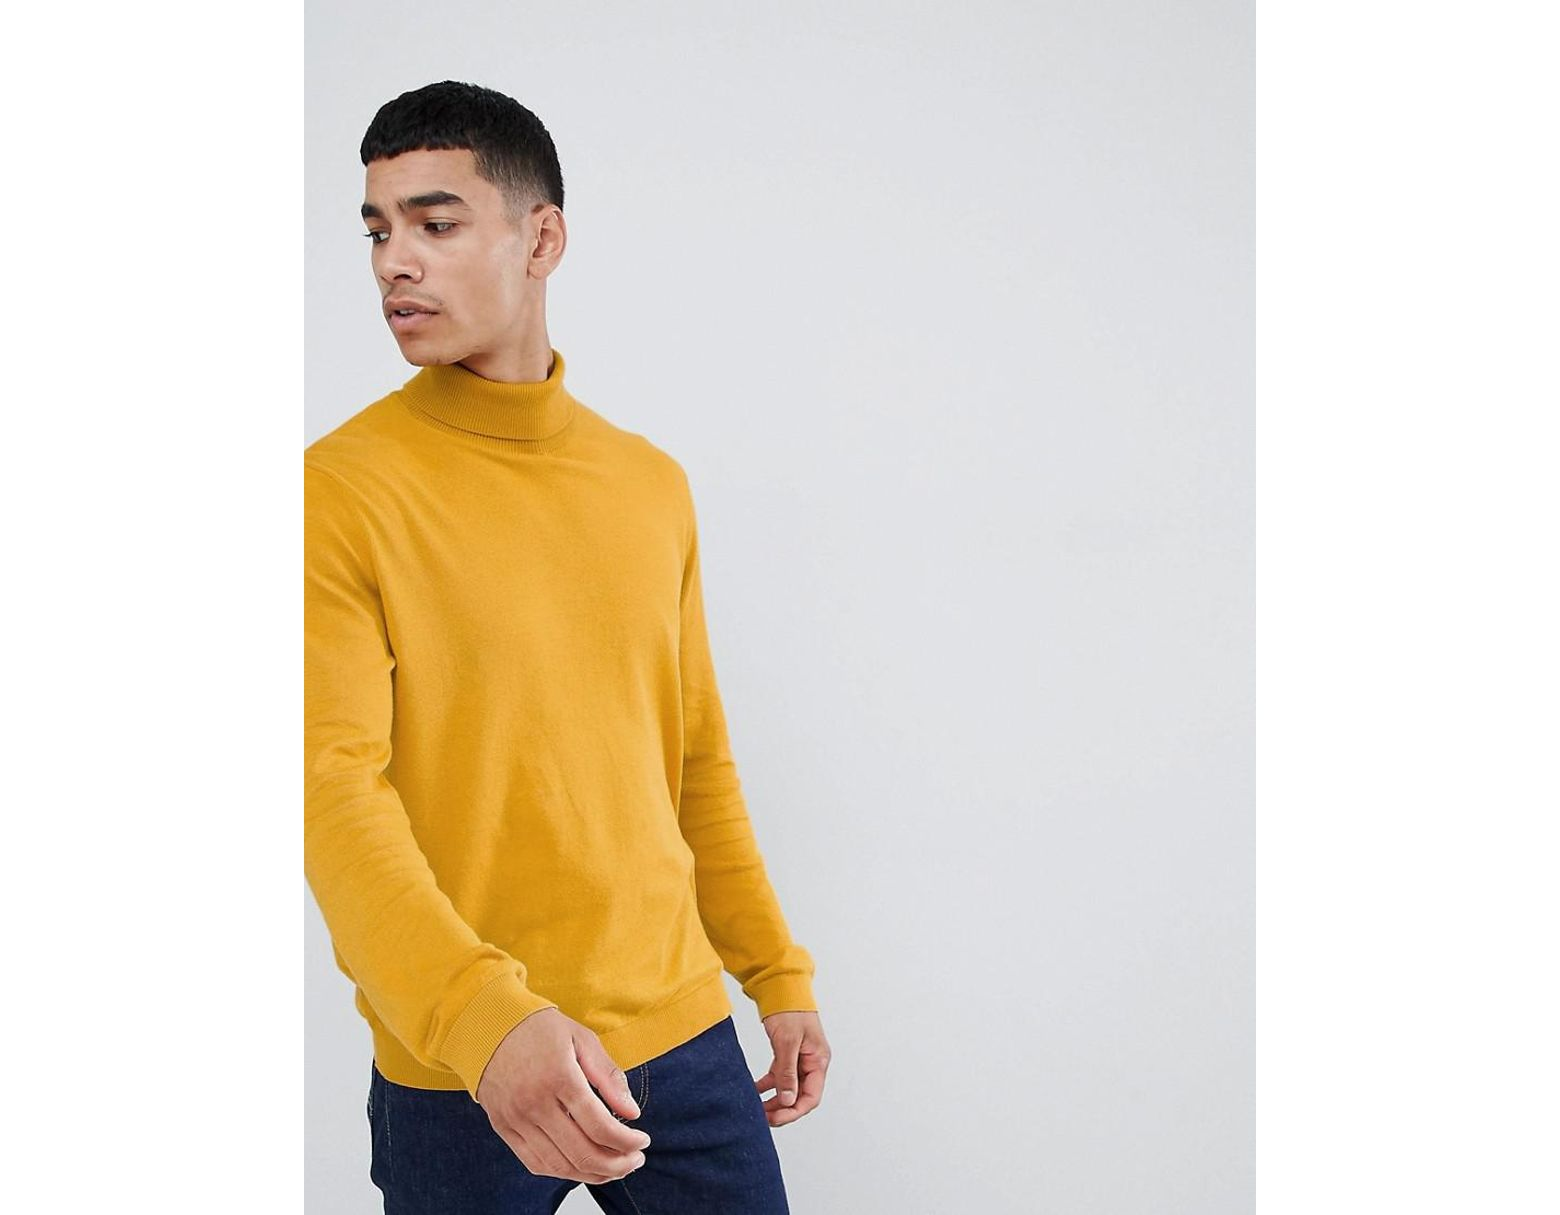 32e8f9c31d1 Men's Yellow Cotton Roll Neck Jumper In Mustard